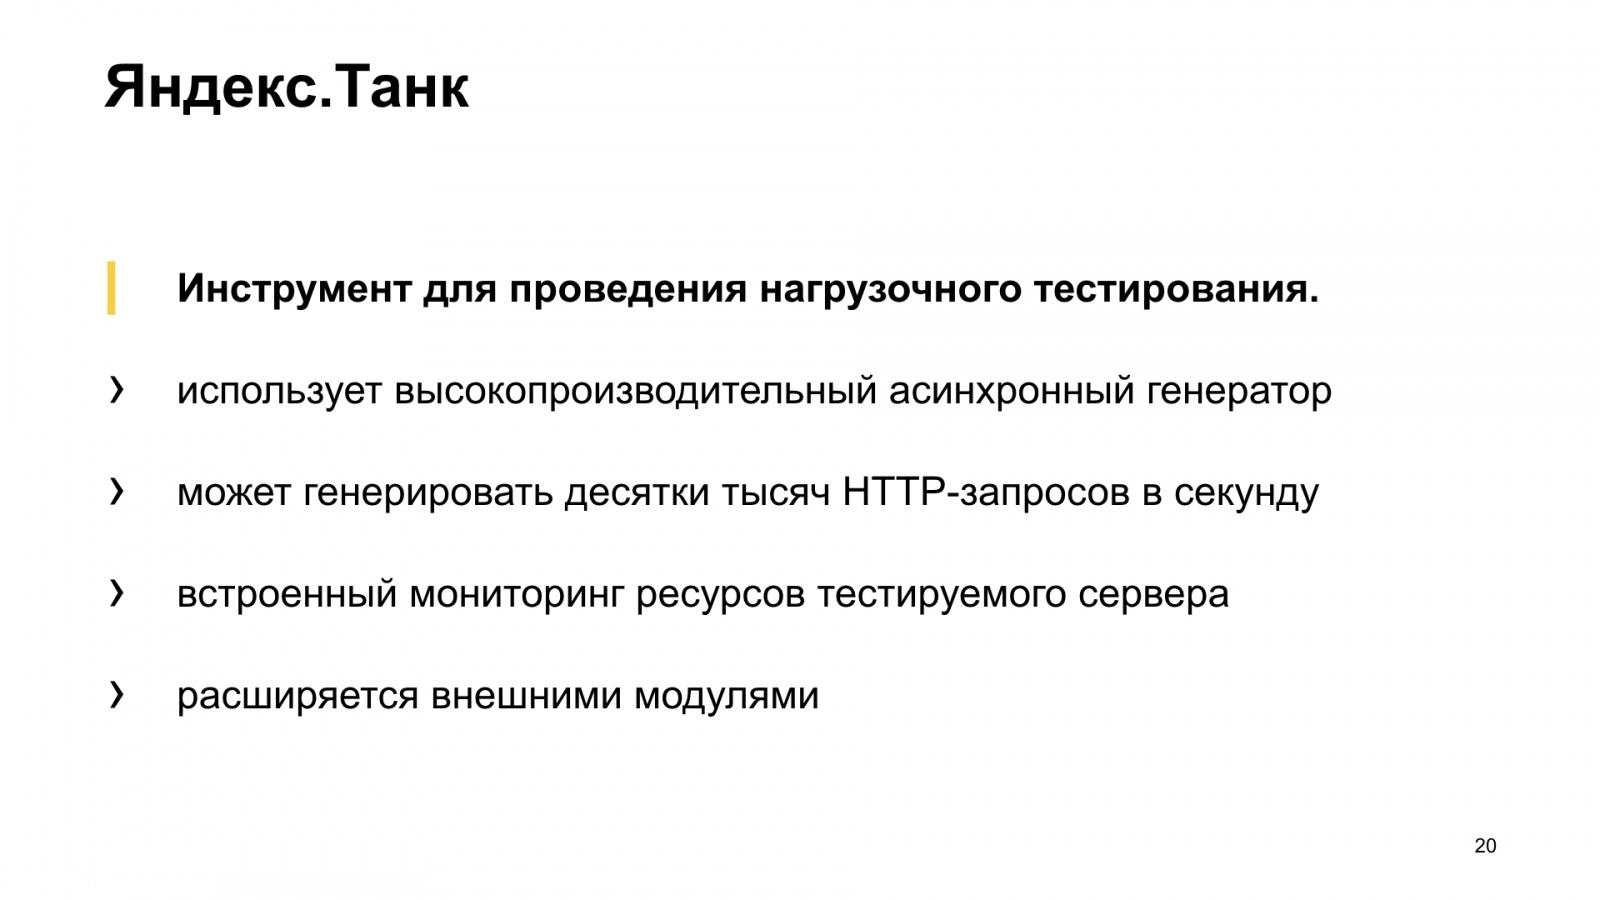 uWSGI в помощь метрикам. Доклад Яндекса - 13